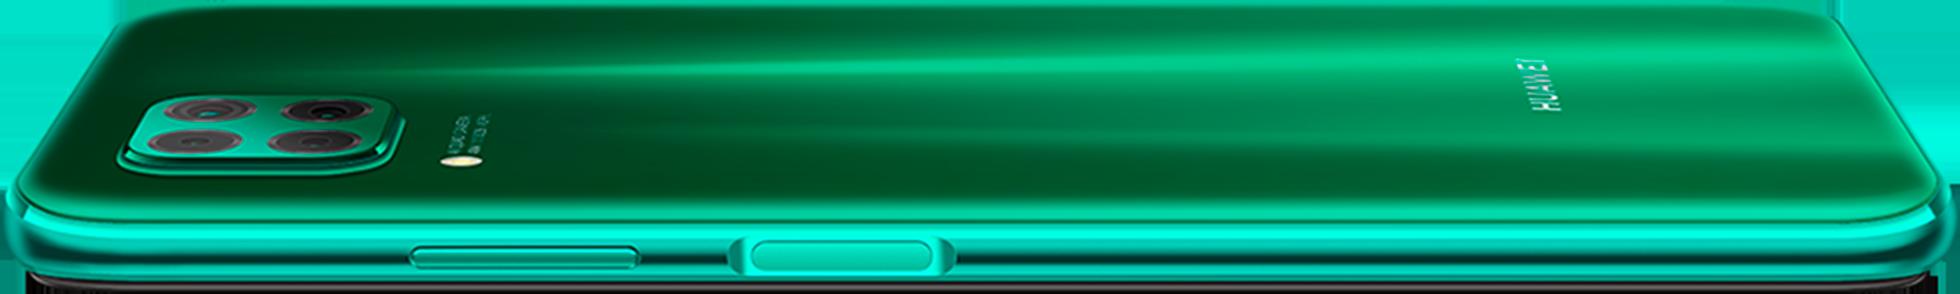 HUAWEI nova 7i Crush Green